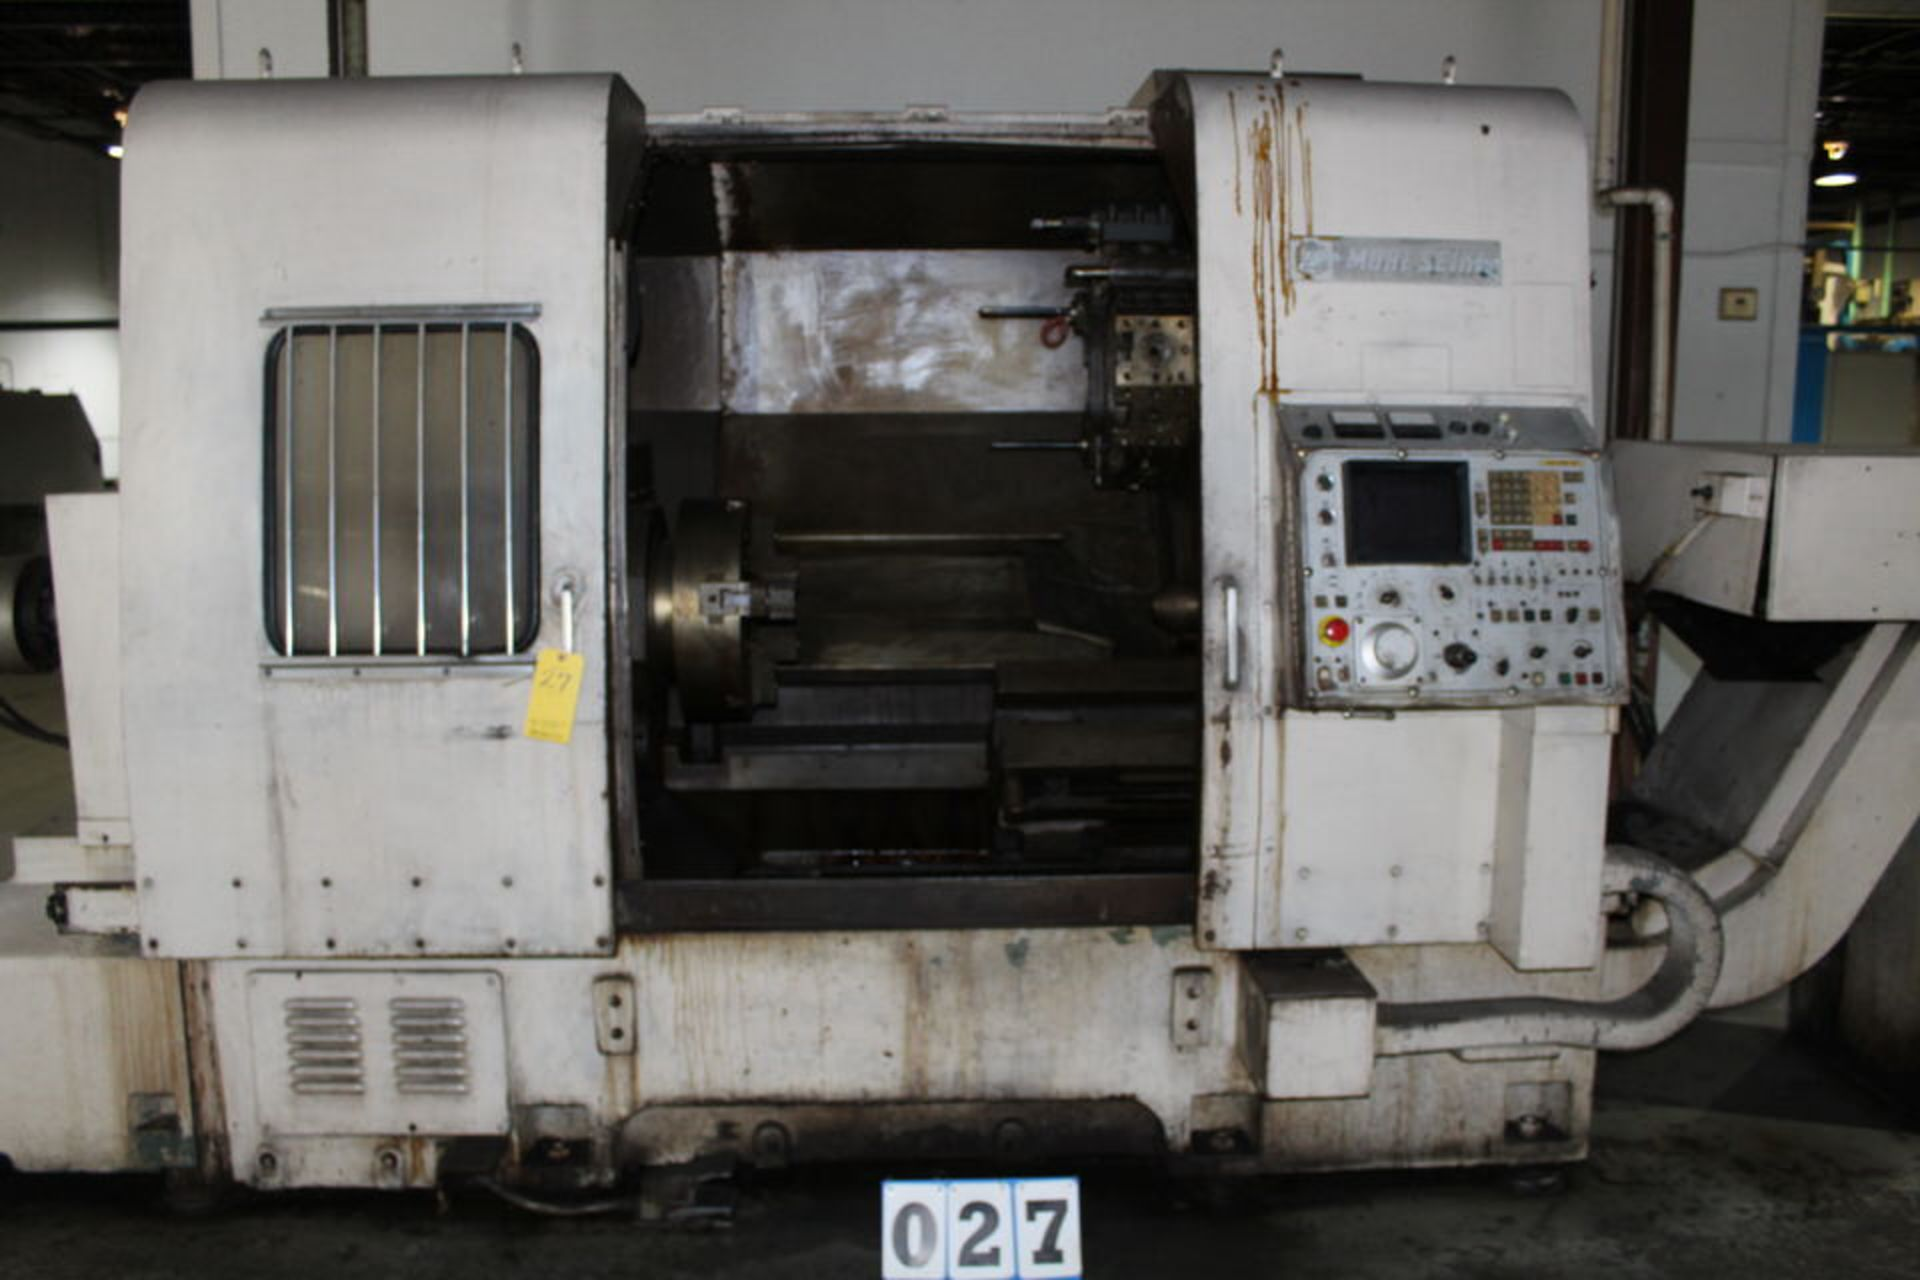 Lot 27 - MORI SEIKI SL-6 CNC LATHE W/ FANUC SYSTEM 6T CONTROL W/ TOOLING